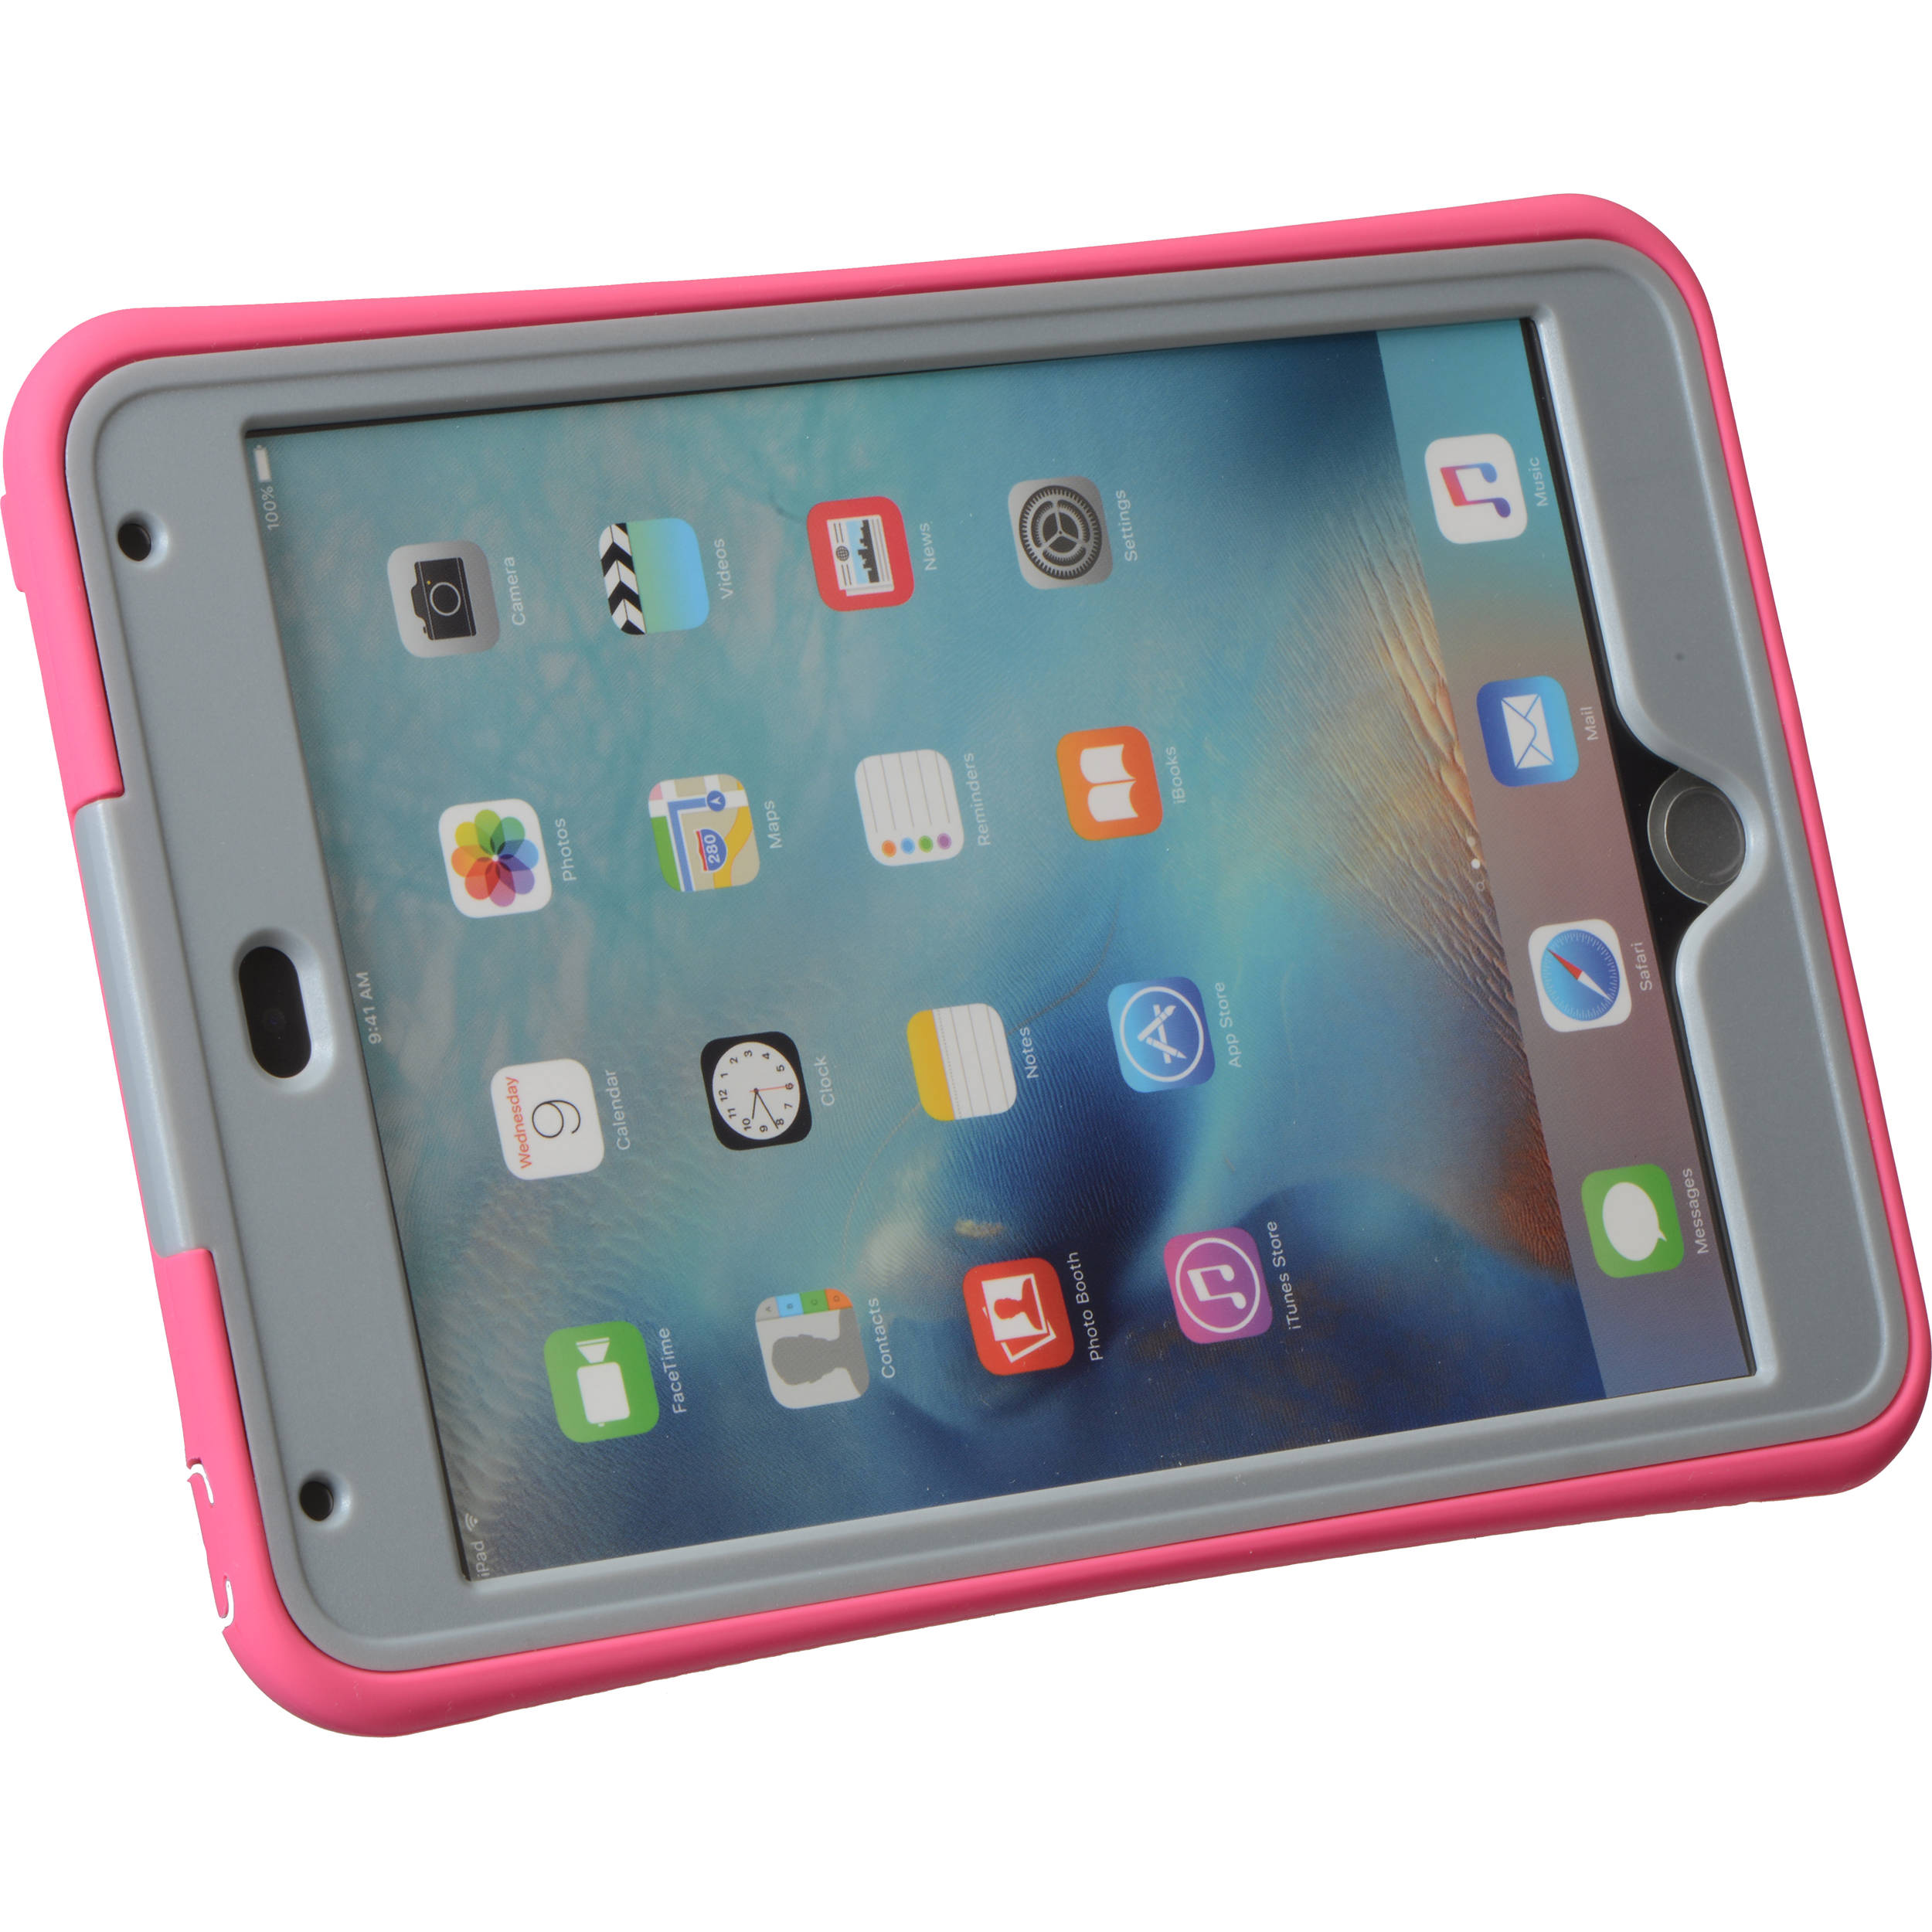 factory authentic ea66a a6de6 Griffin Technology Survivor Slim Case for iPad mini 4 (Honeysuckle/Mineral  Gray)